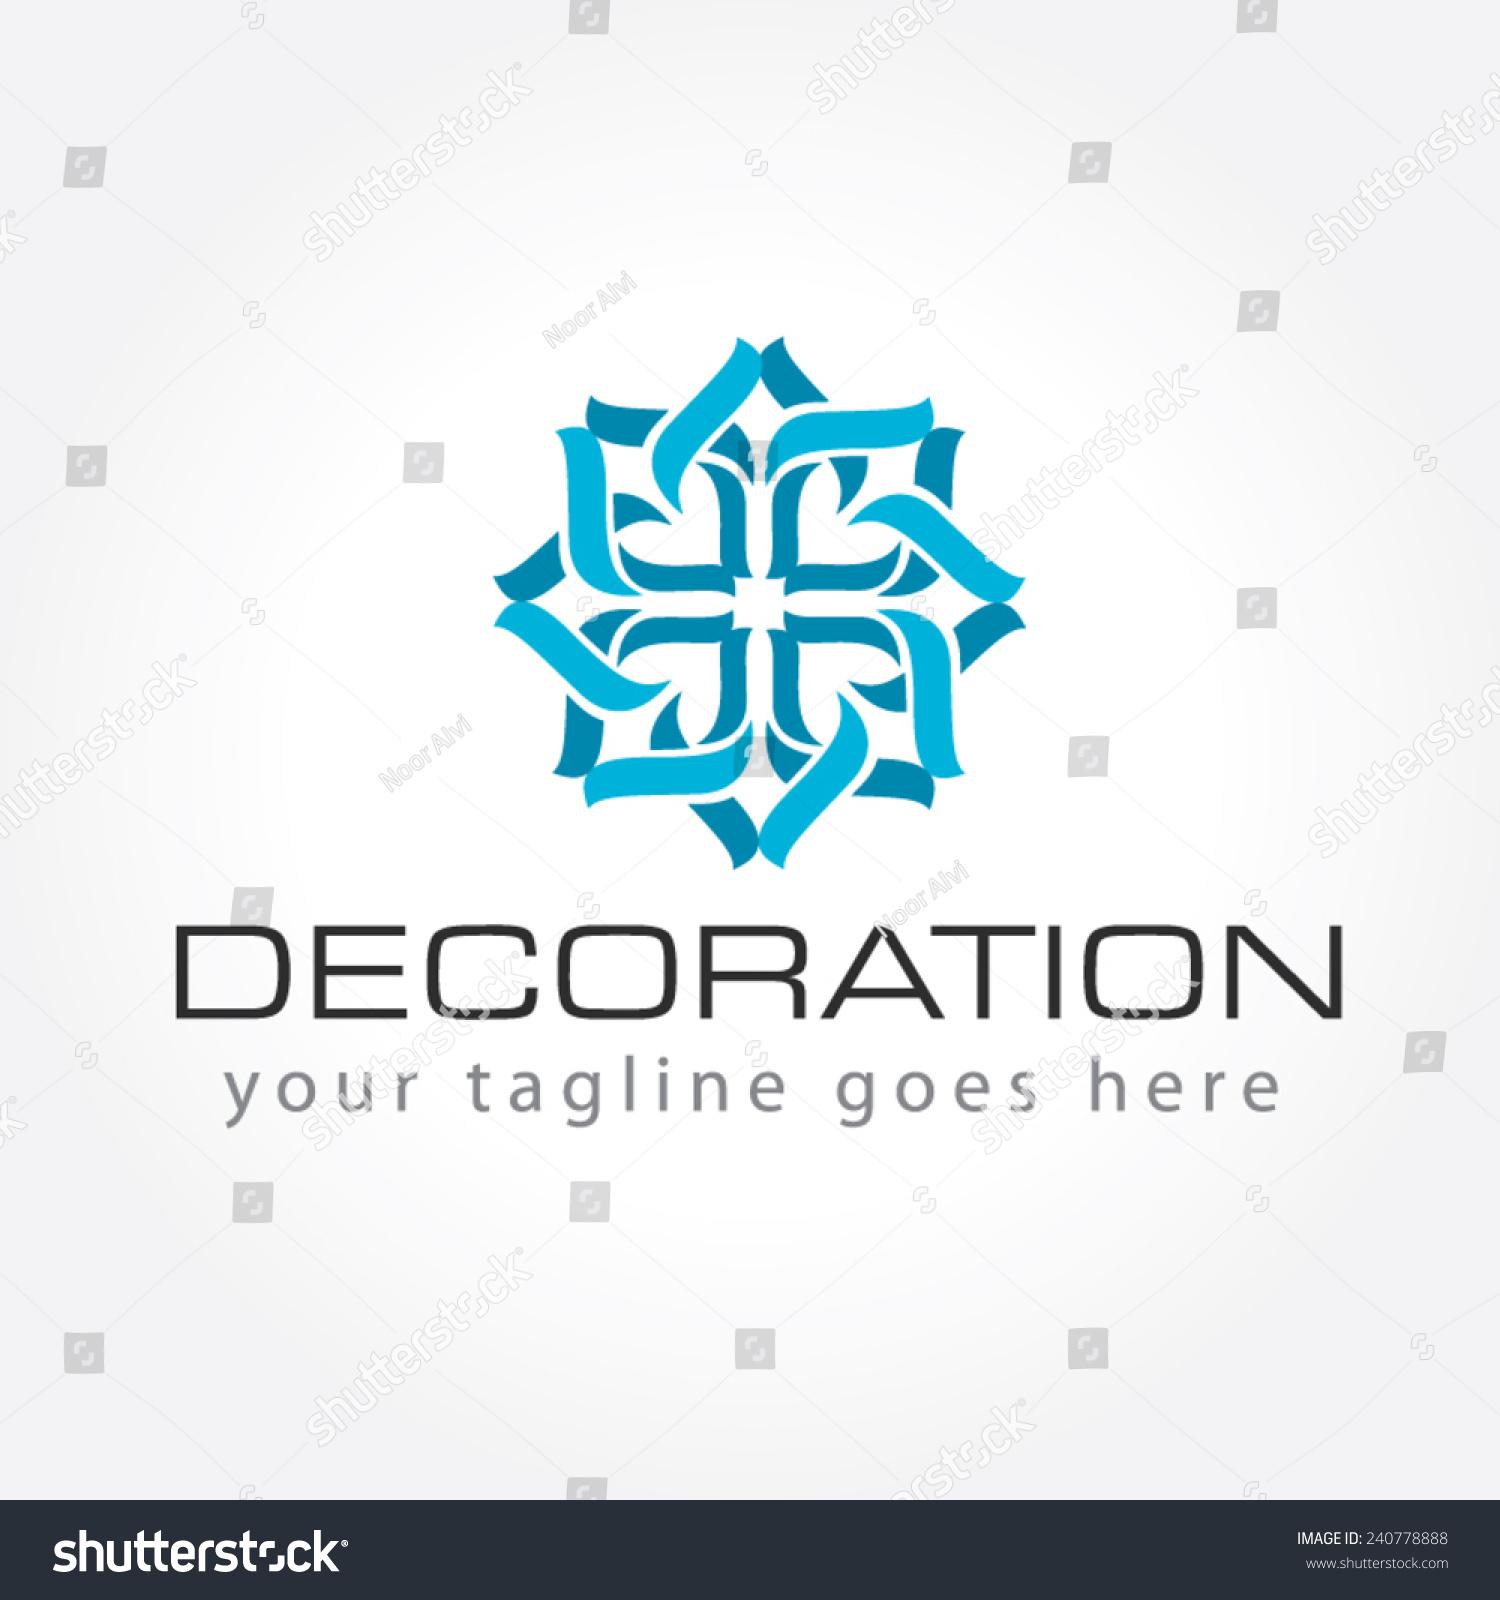 Decoration logo interior decoration logo stock vector for Decoration logo